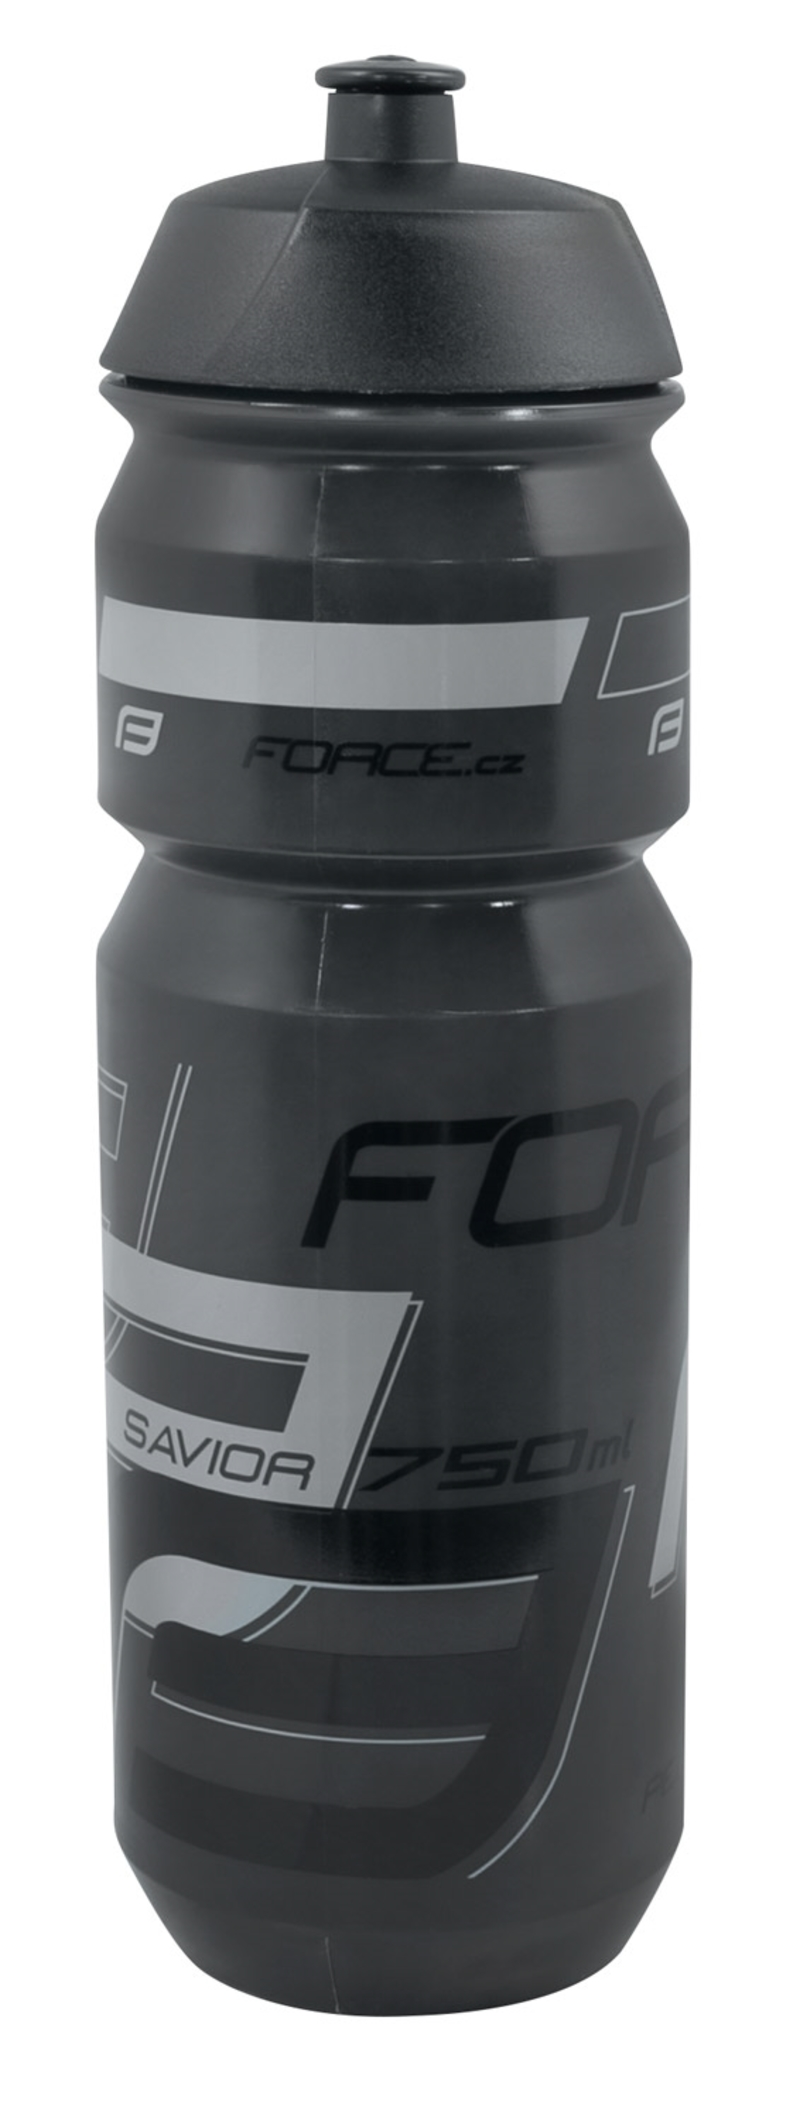 Force láhev SAVIOR 0,7 l